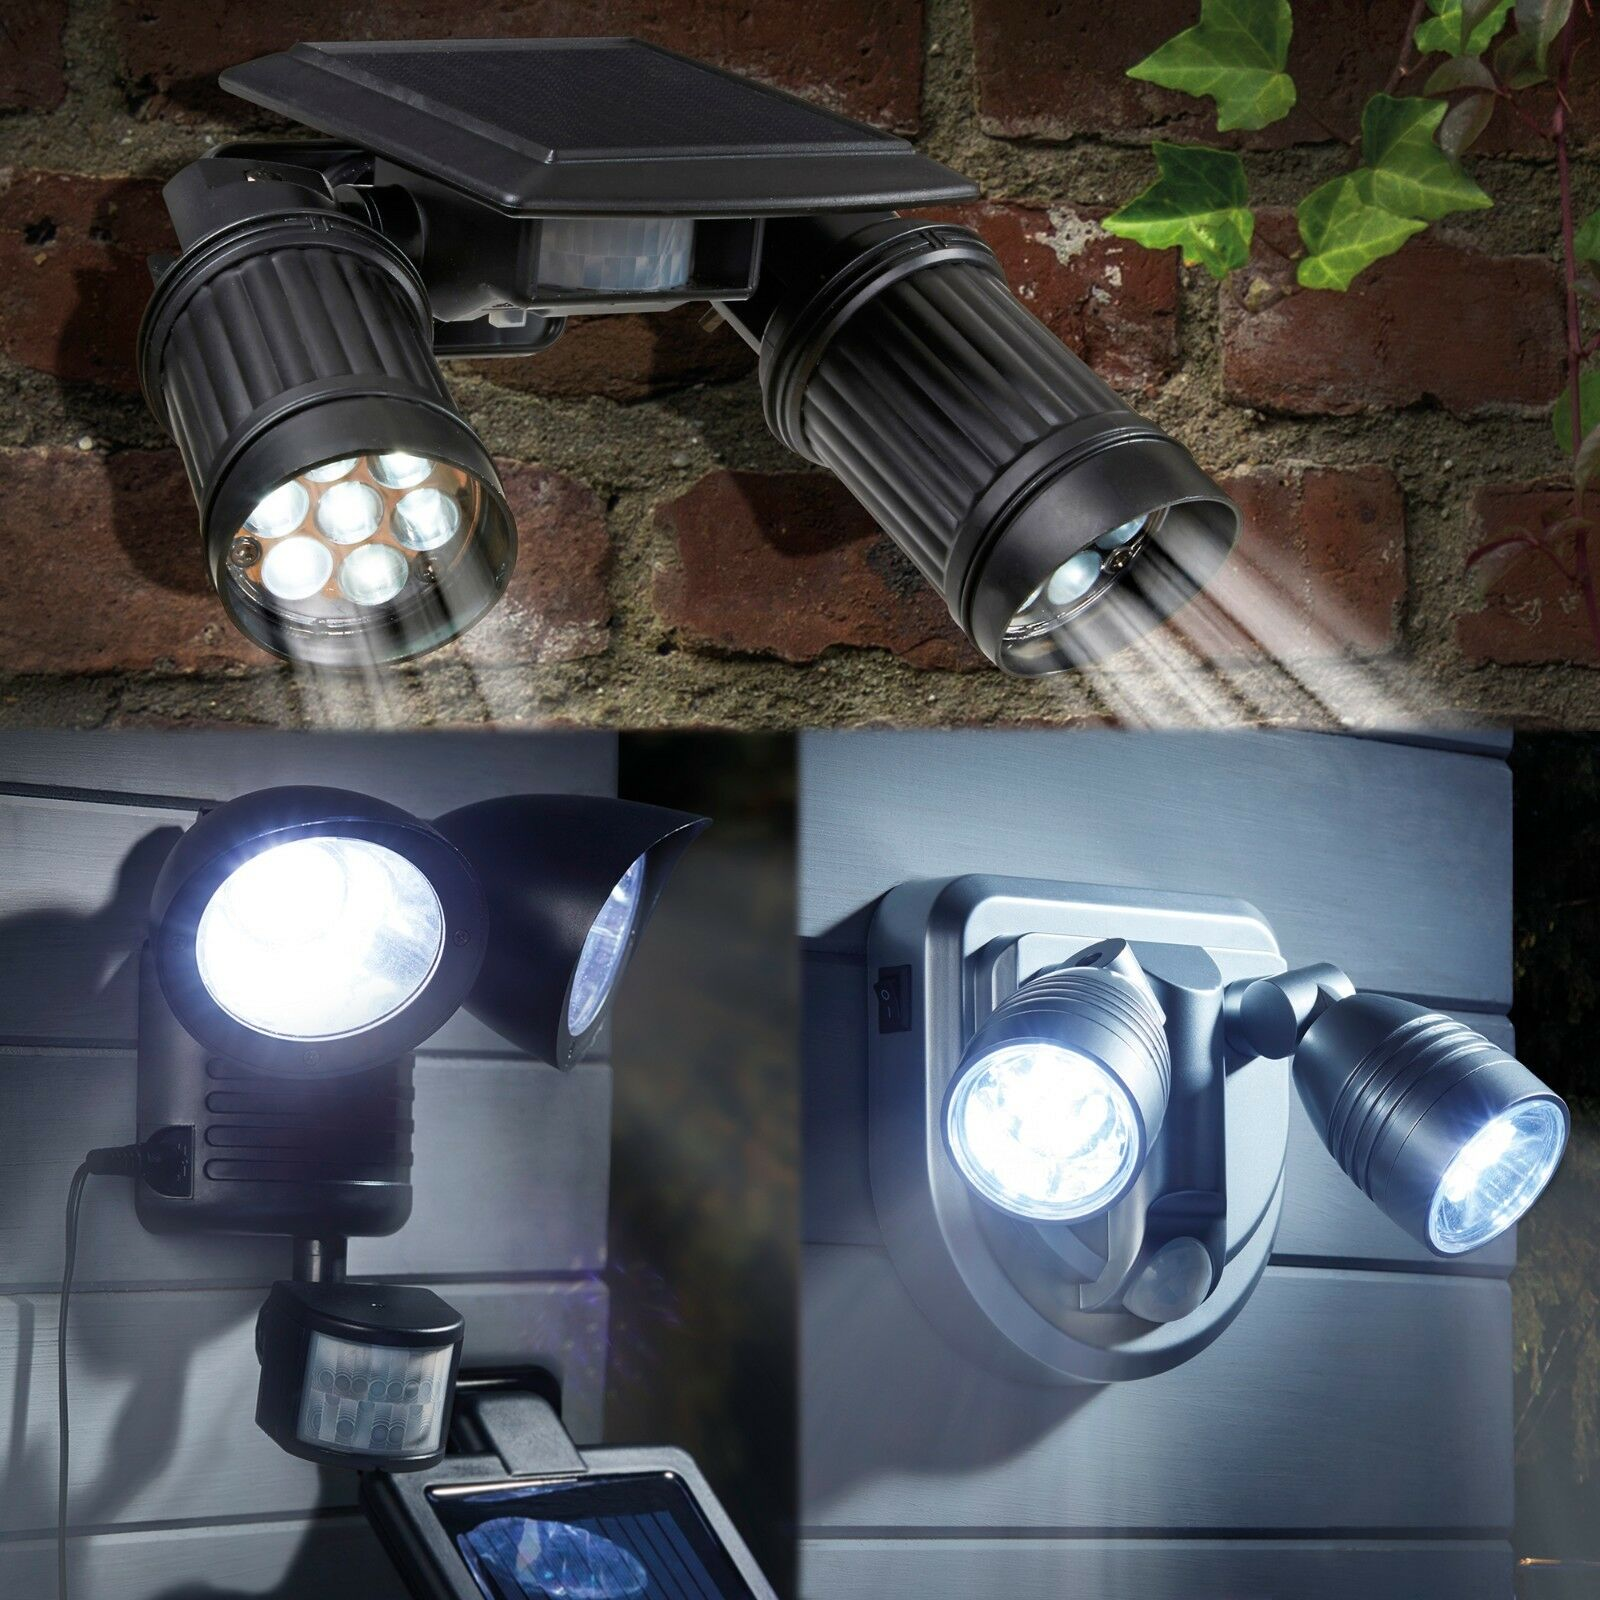 Security Light LED Motion Sensor Wireless Super Bright 90 Degree Adjustable 3 Metre Detection Range Zennox